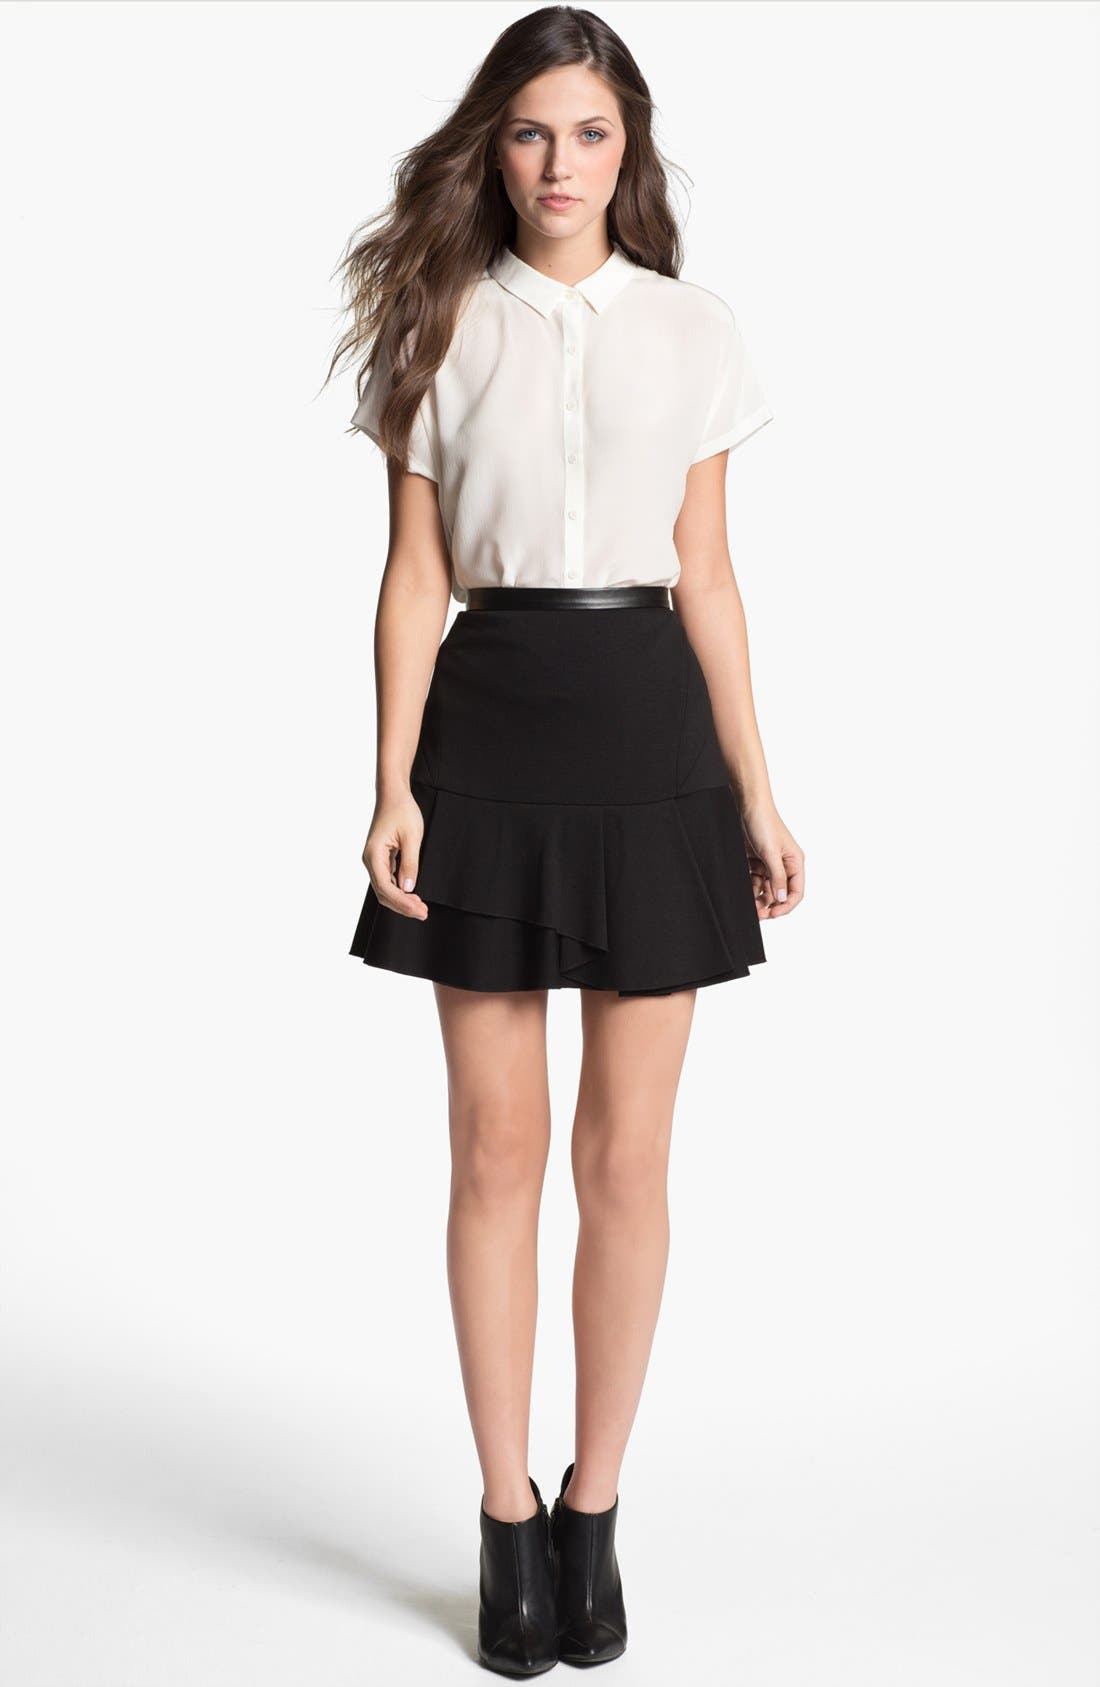 Alternate Image 1 Selected - Trouvé Blouse & Robbi & Nikki Ruffle Skirt